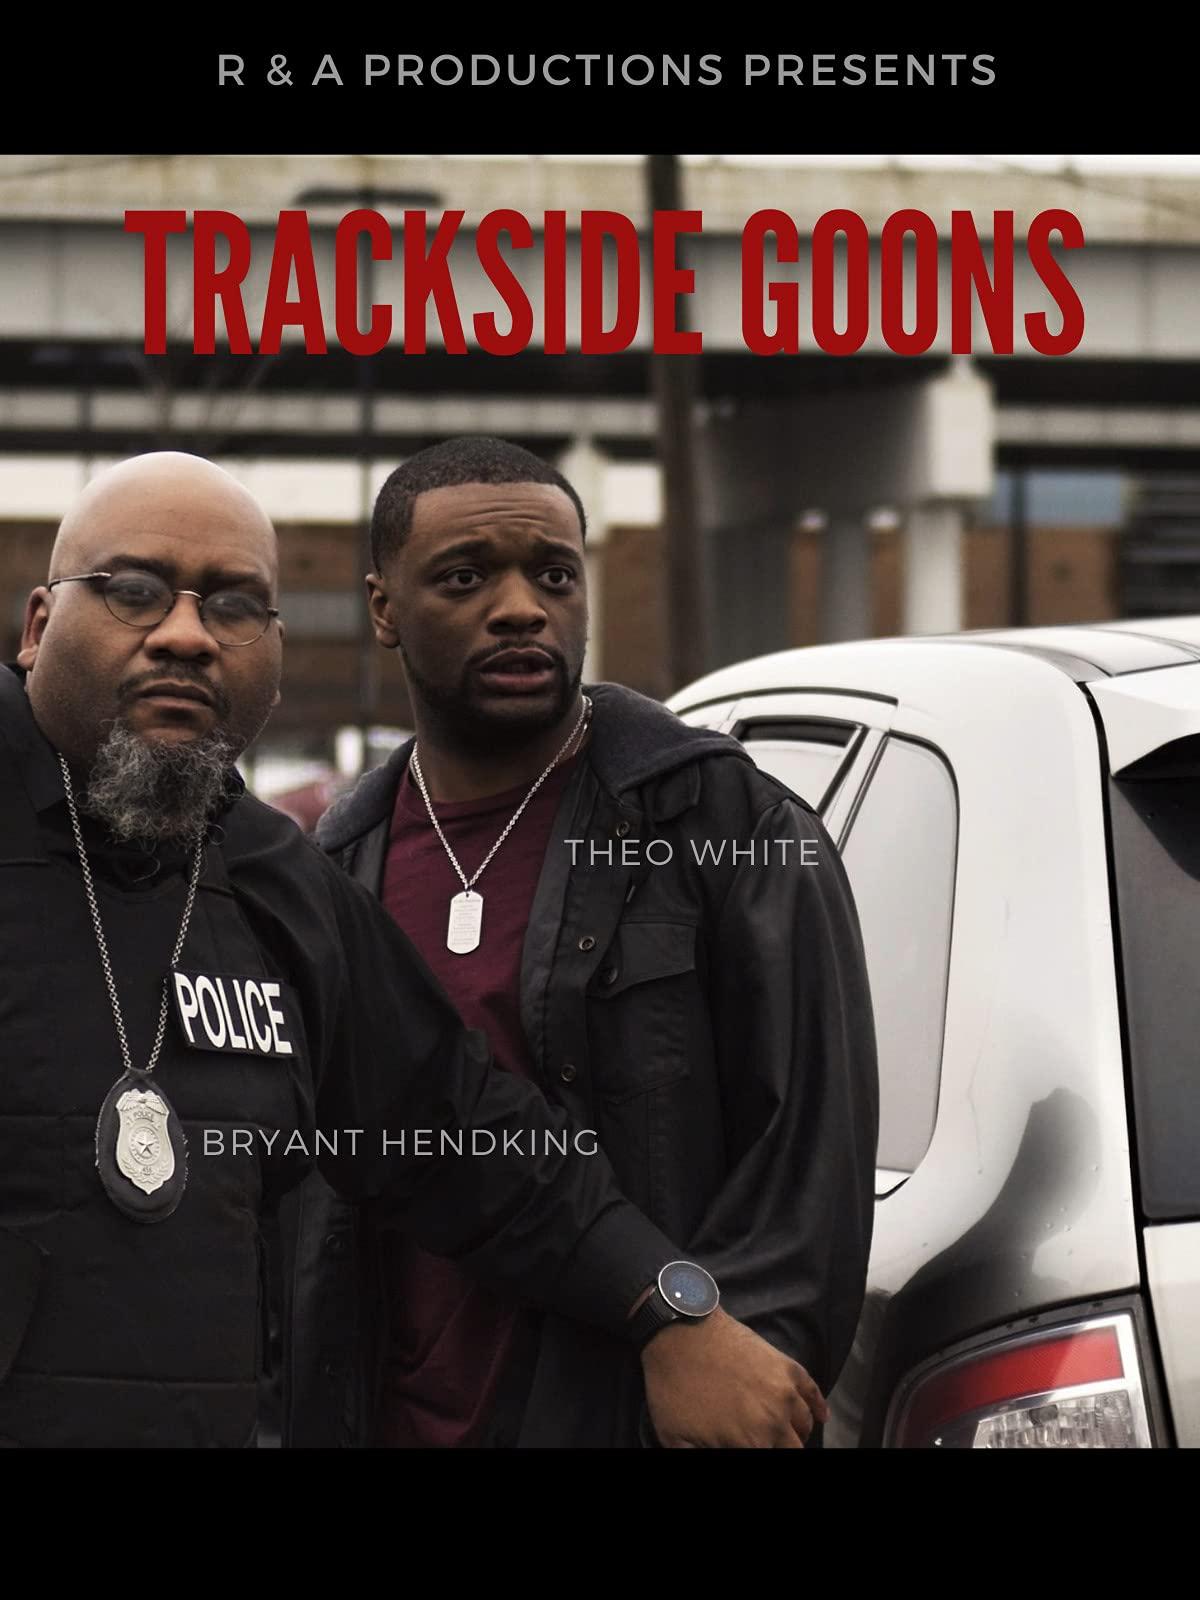 Trackside Goons